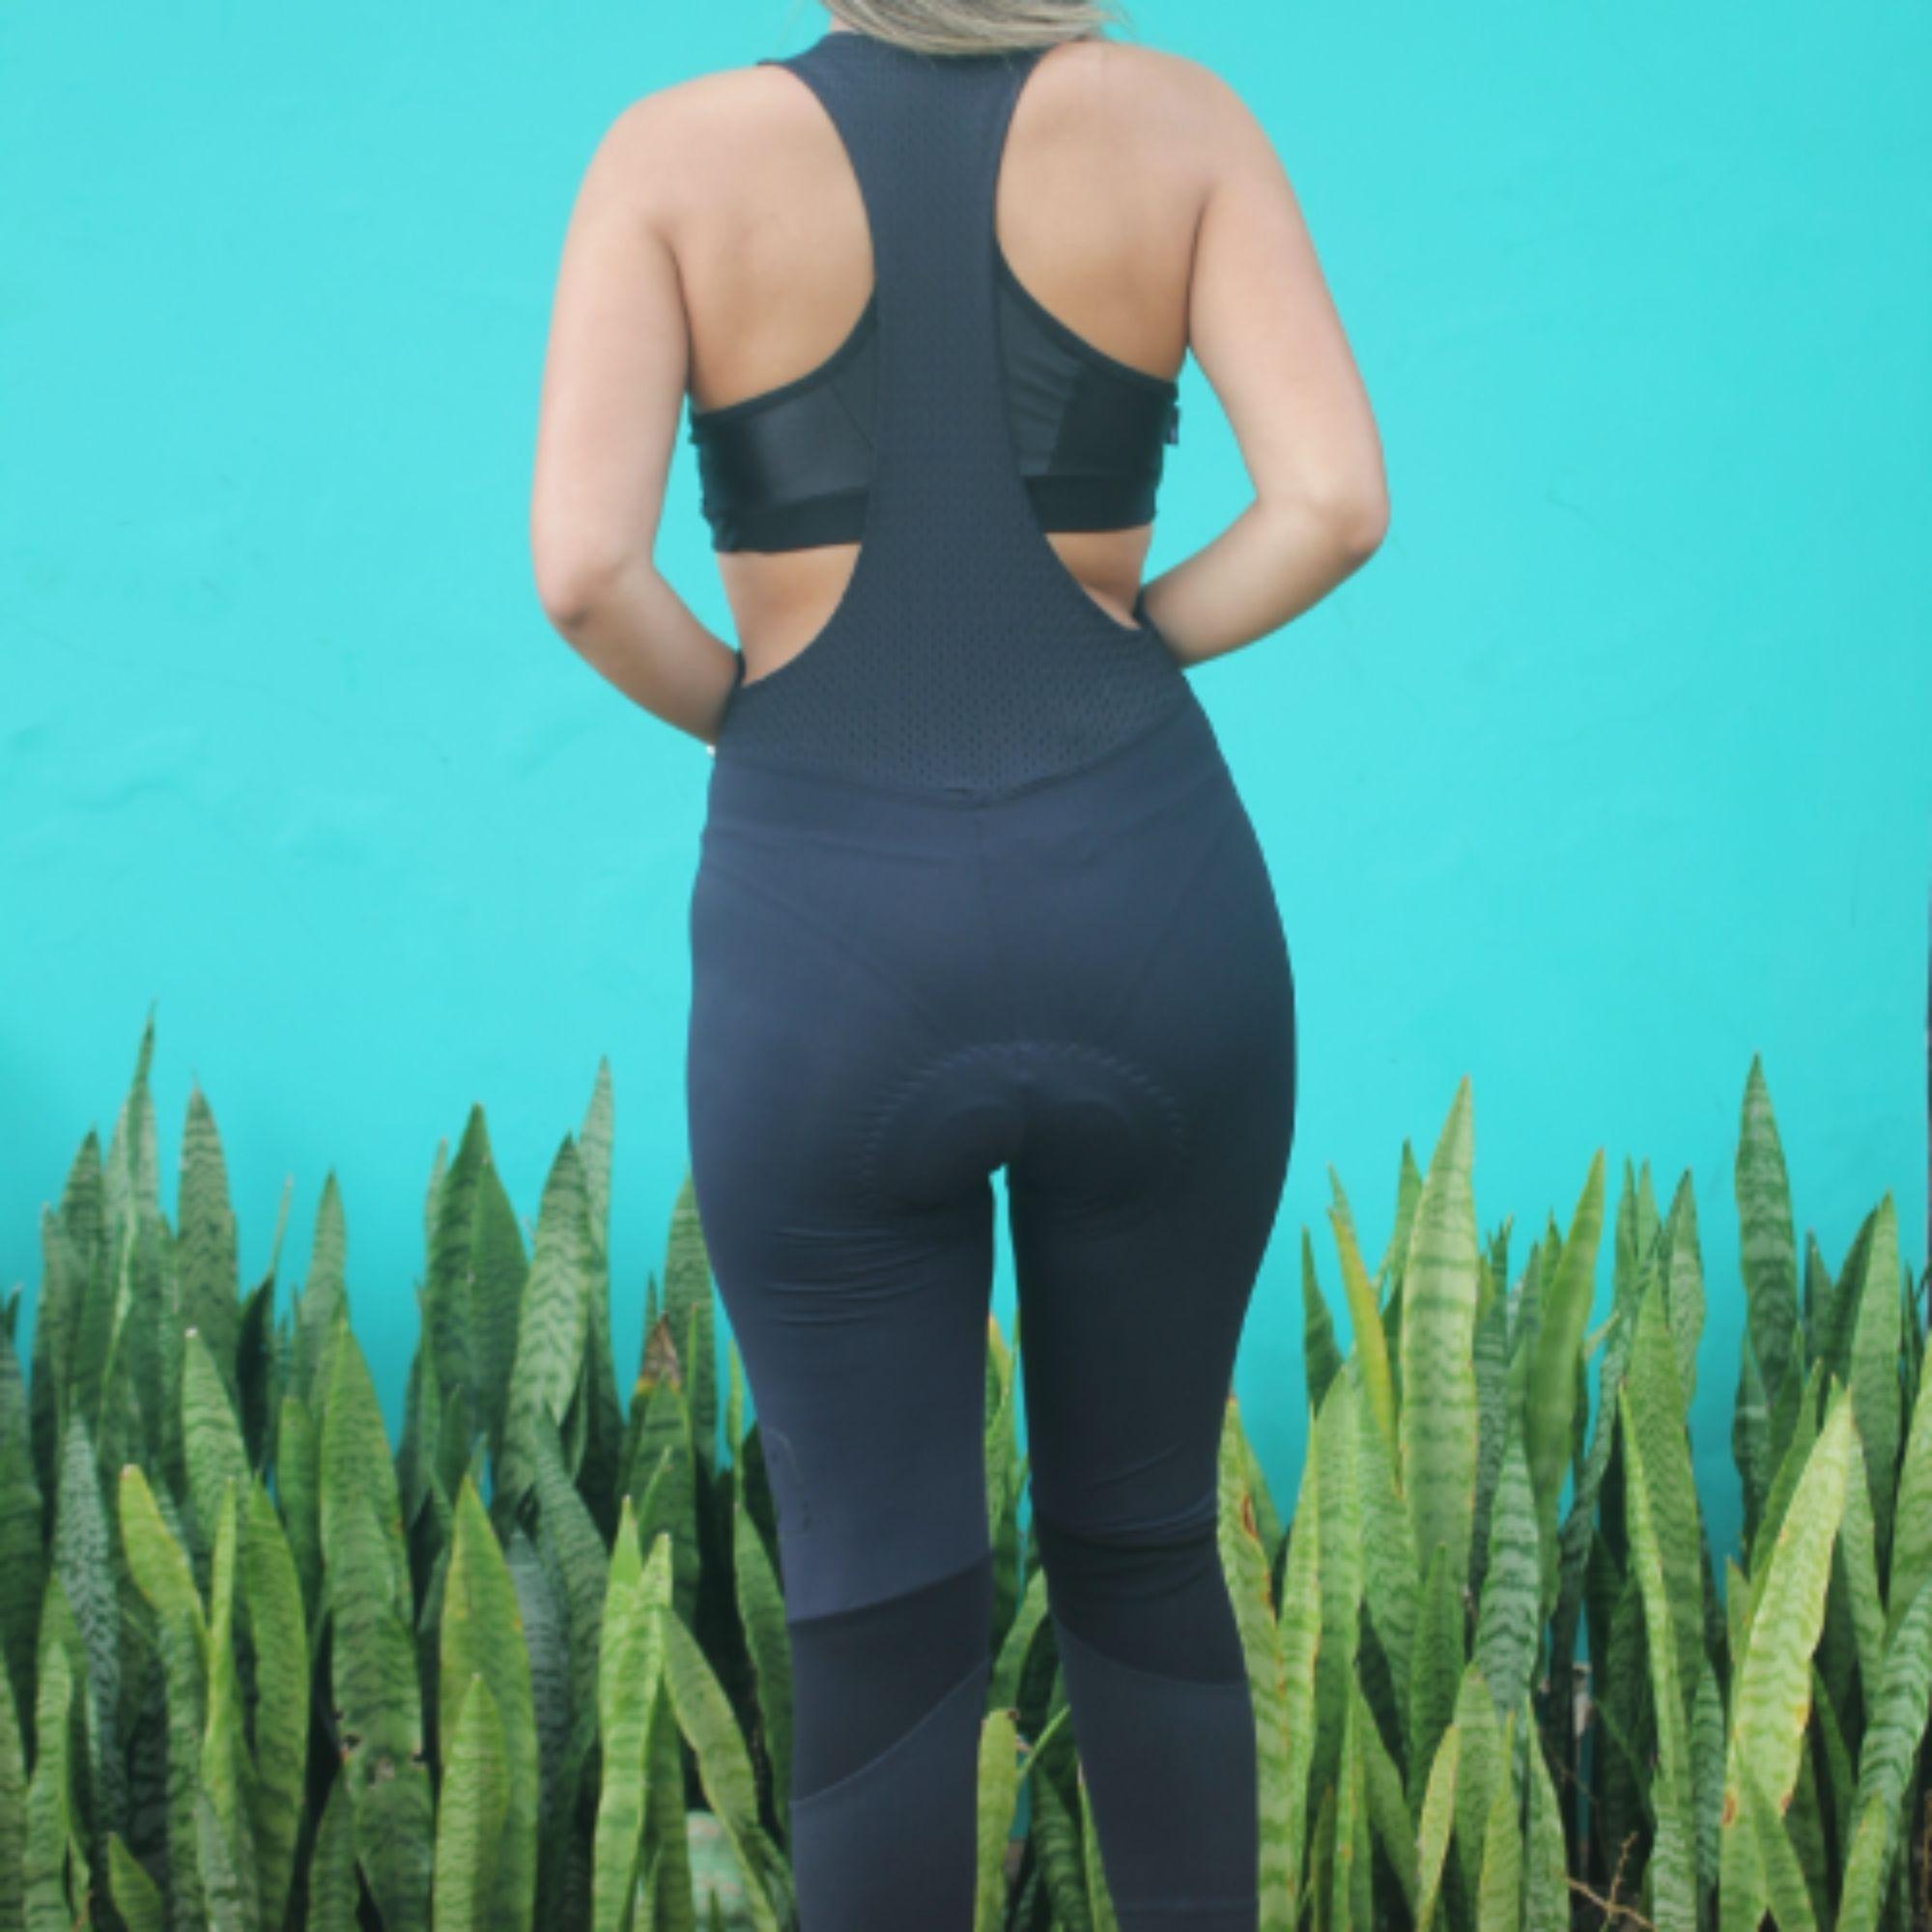 Calça Bretelle Ciclismo Black Tie - Feminino